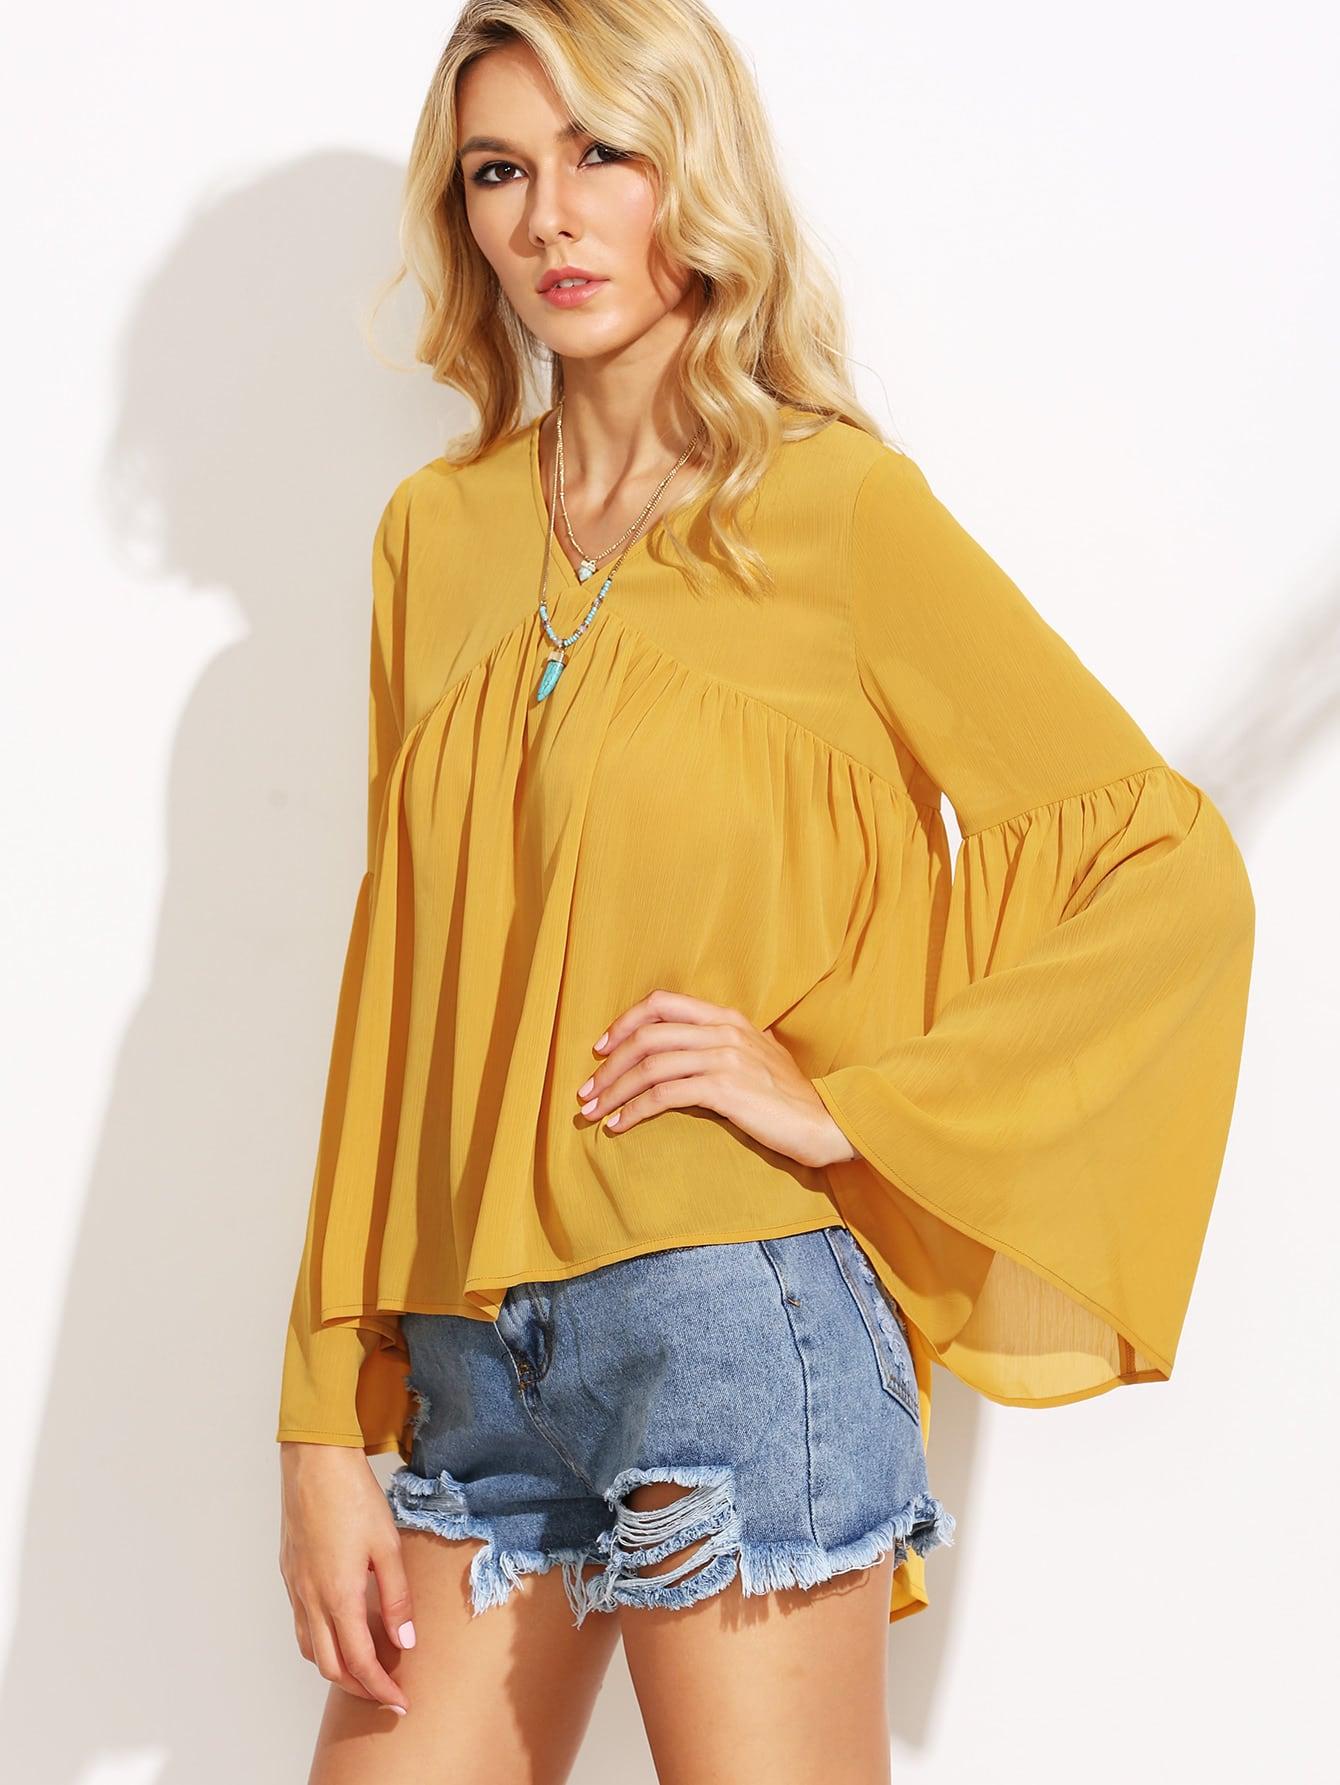 blouse160815505_2